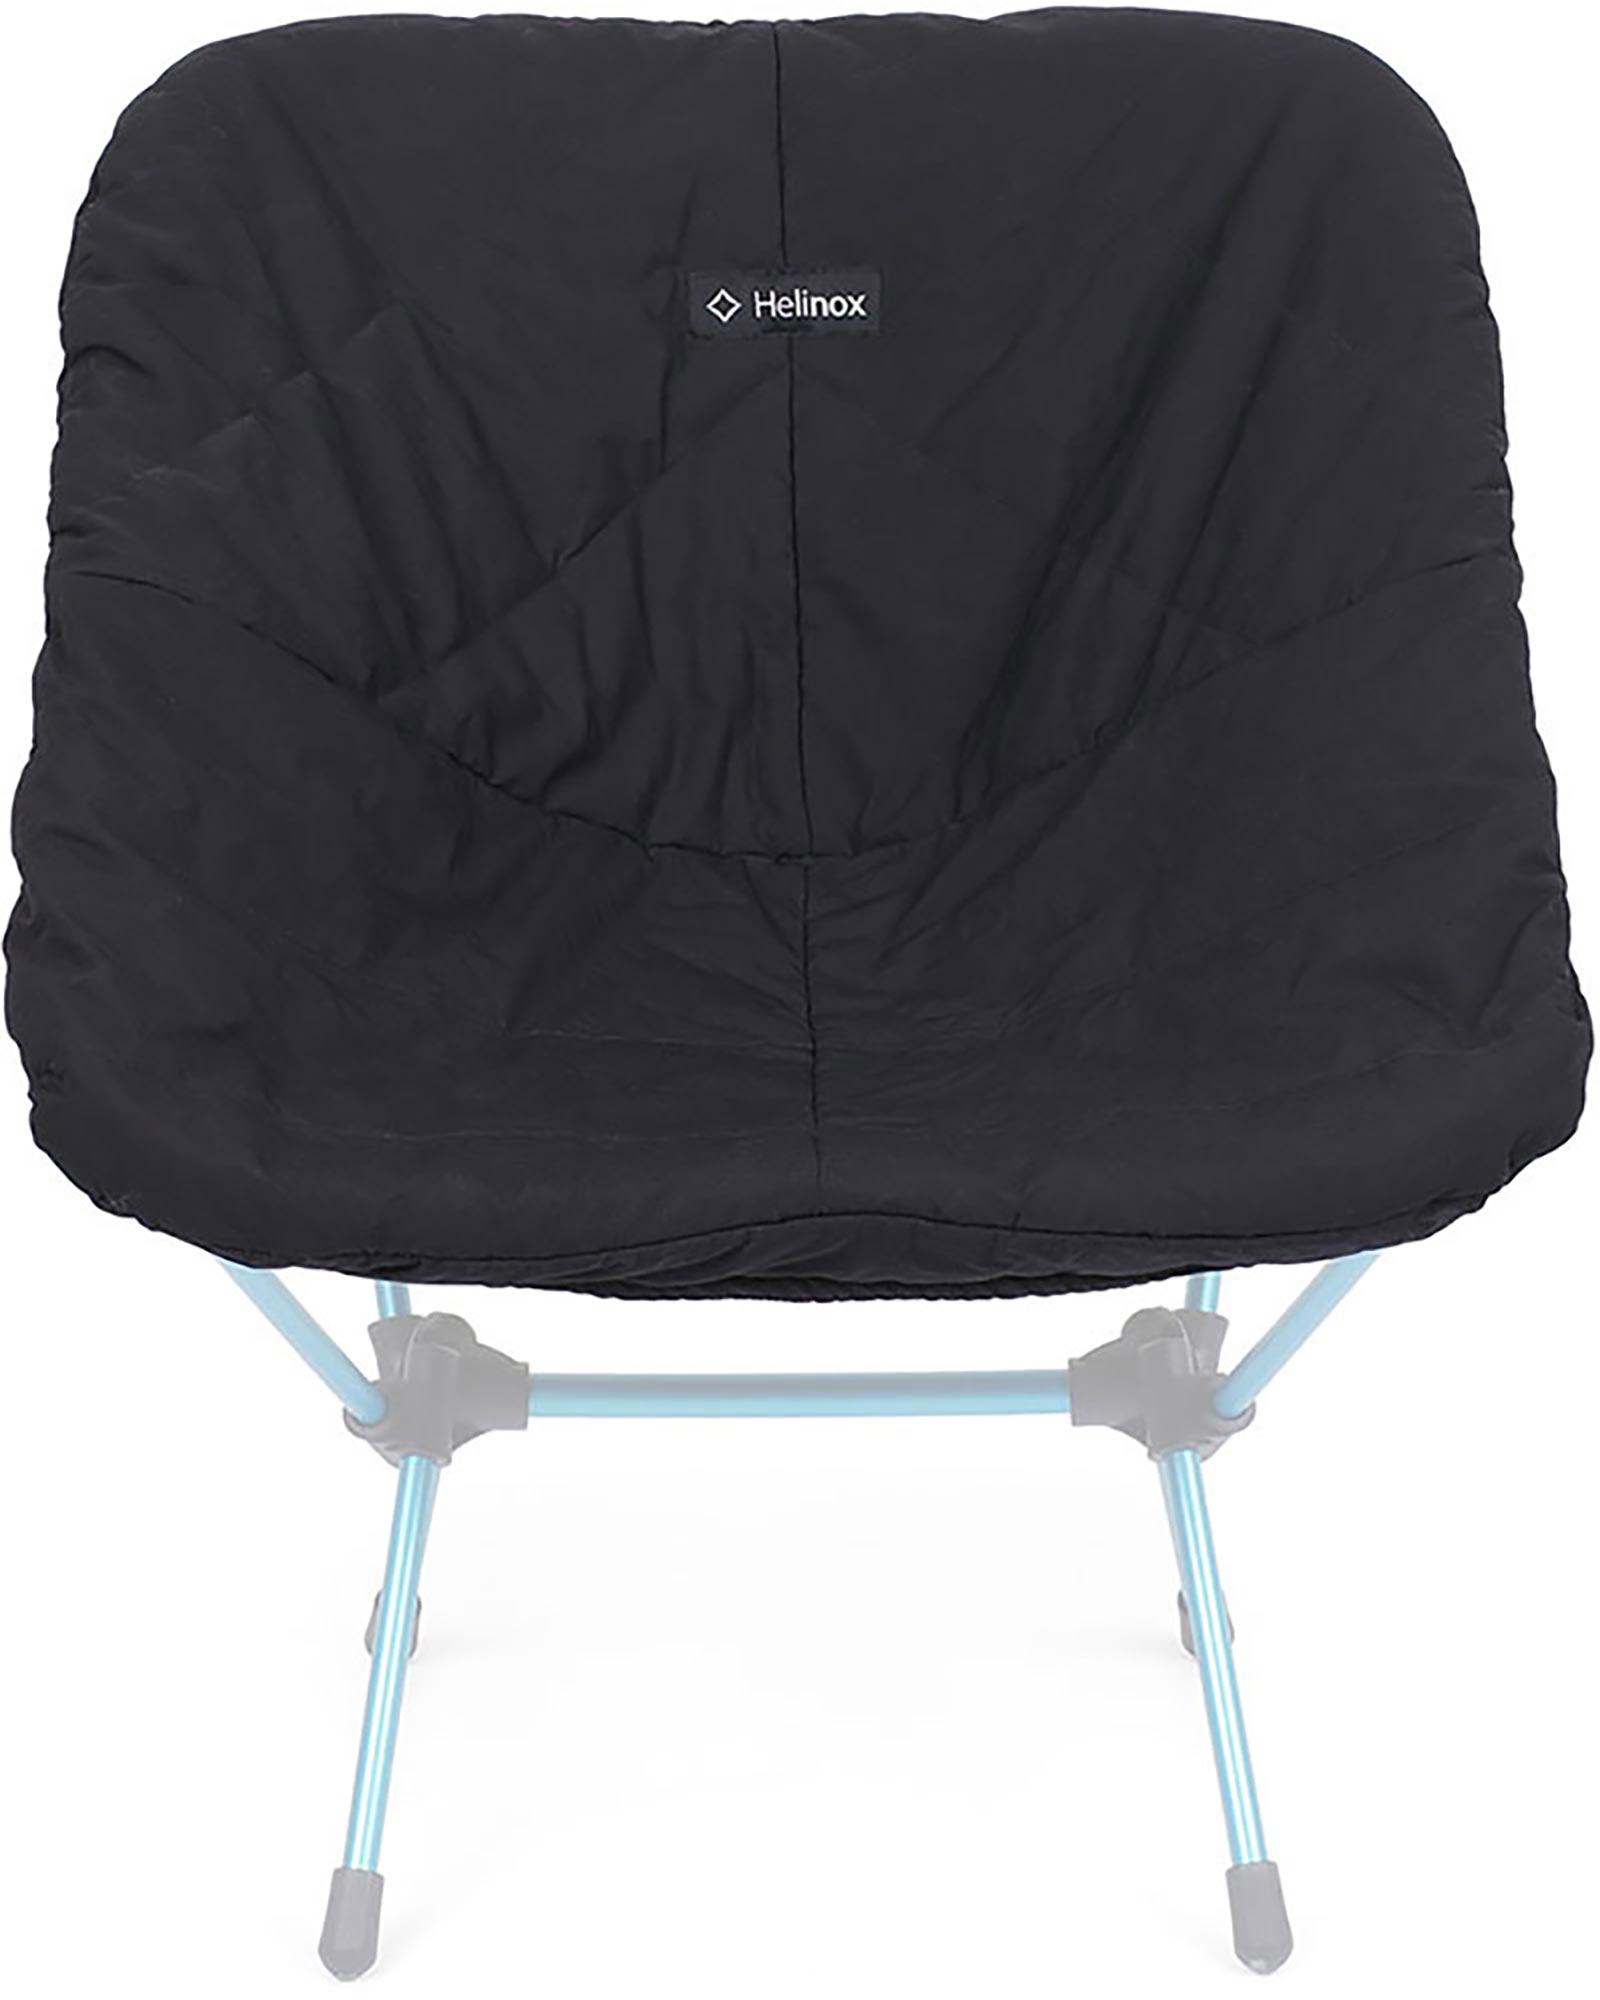 Product image of Helinox Seat Warmer